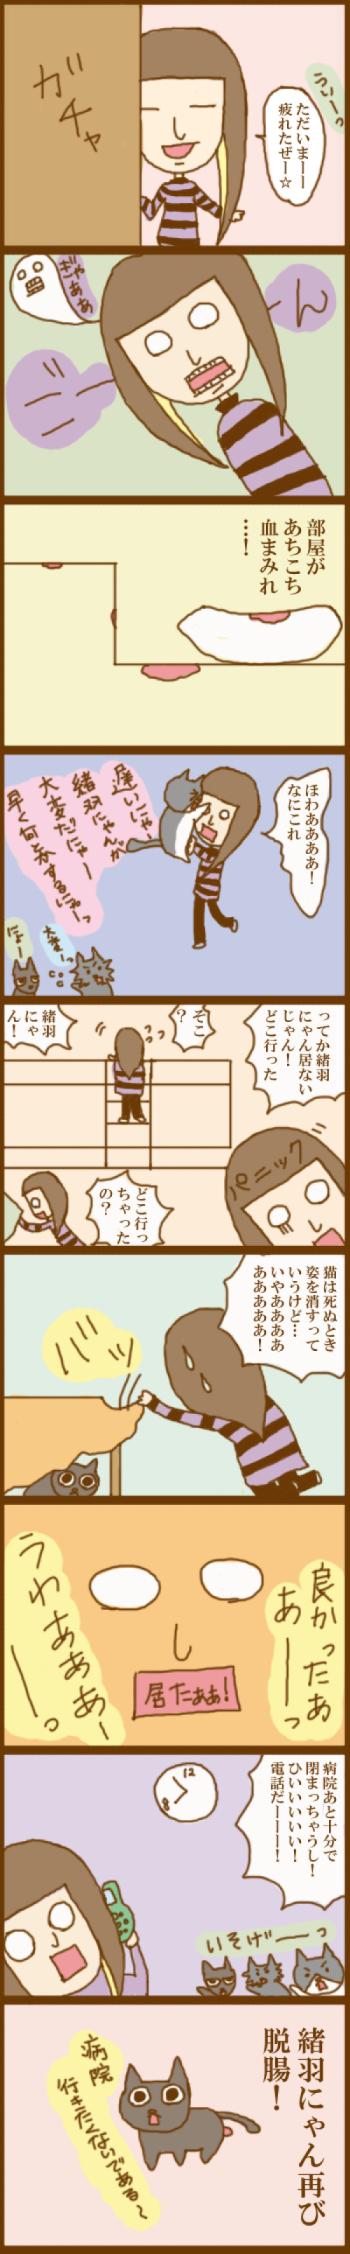 f:id:suzuokayu:20201109092913j:plain